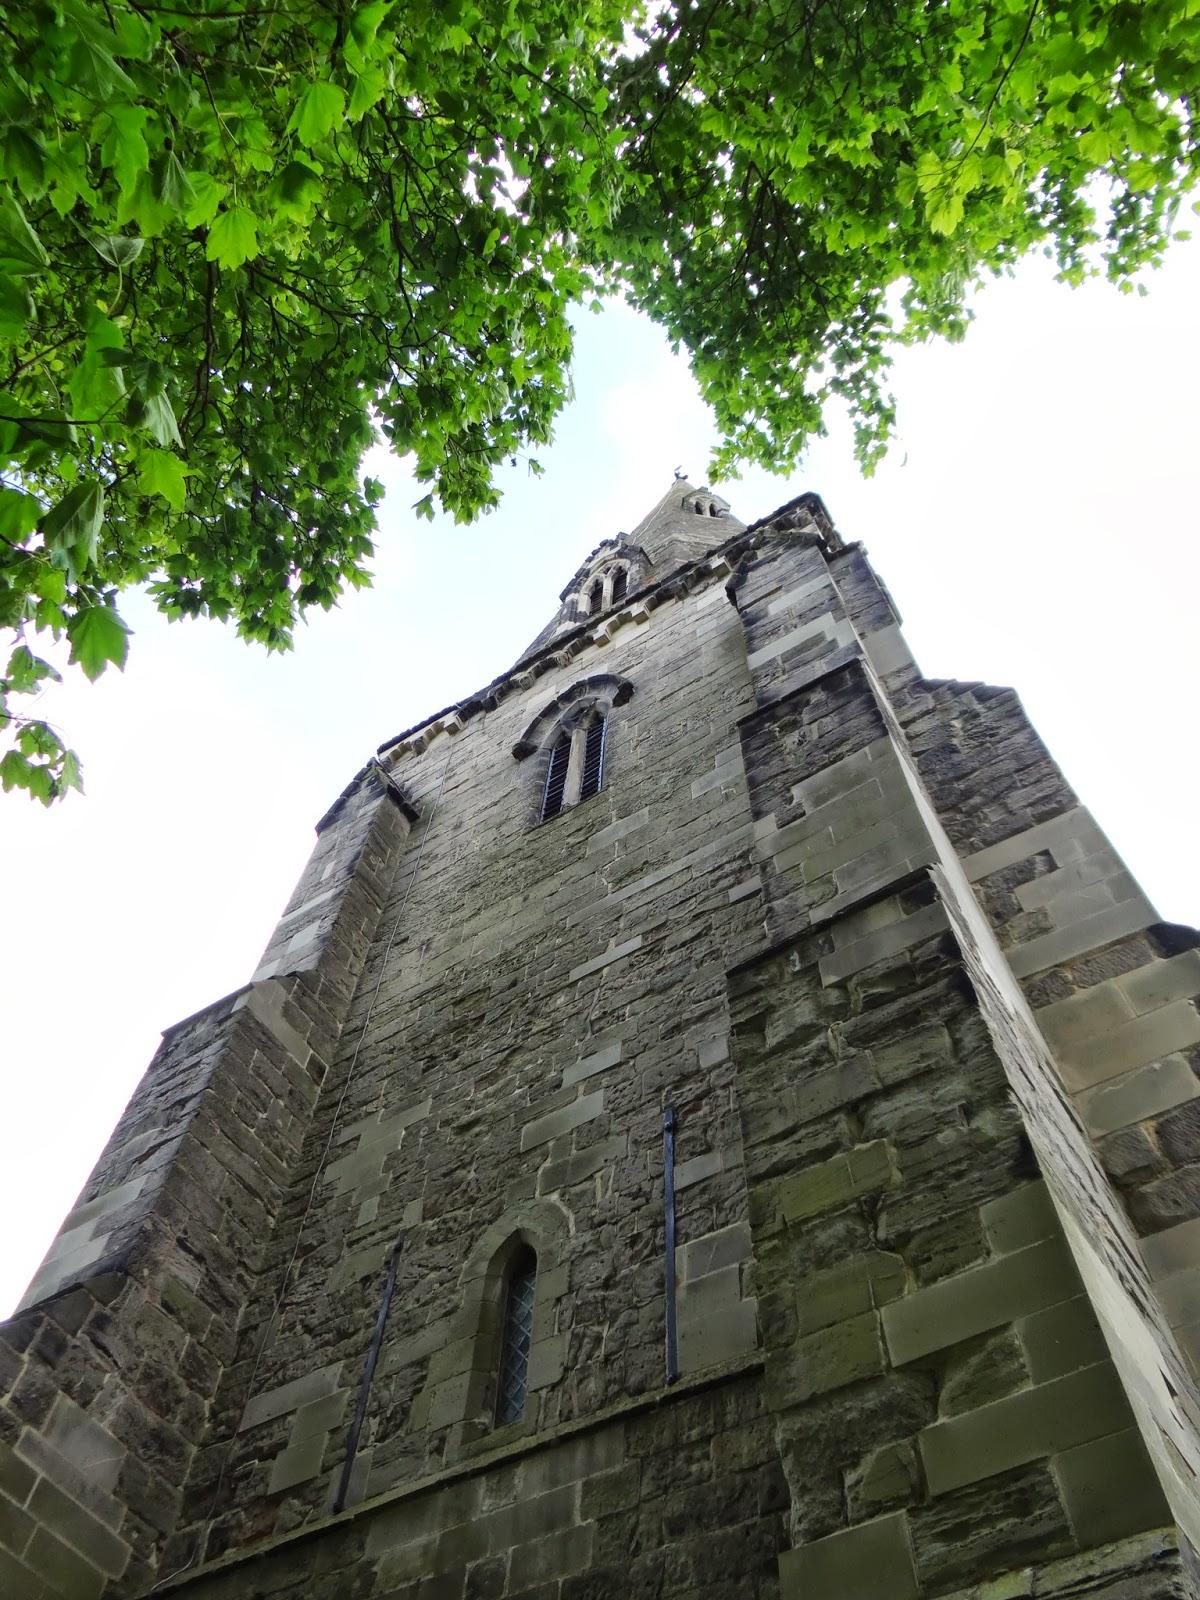 Austrey Church Tower